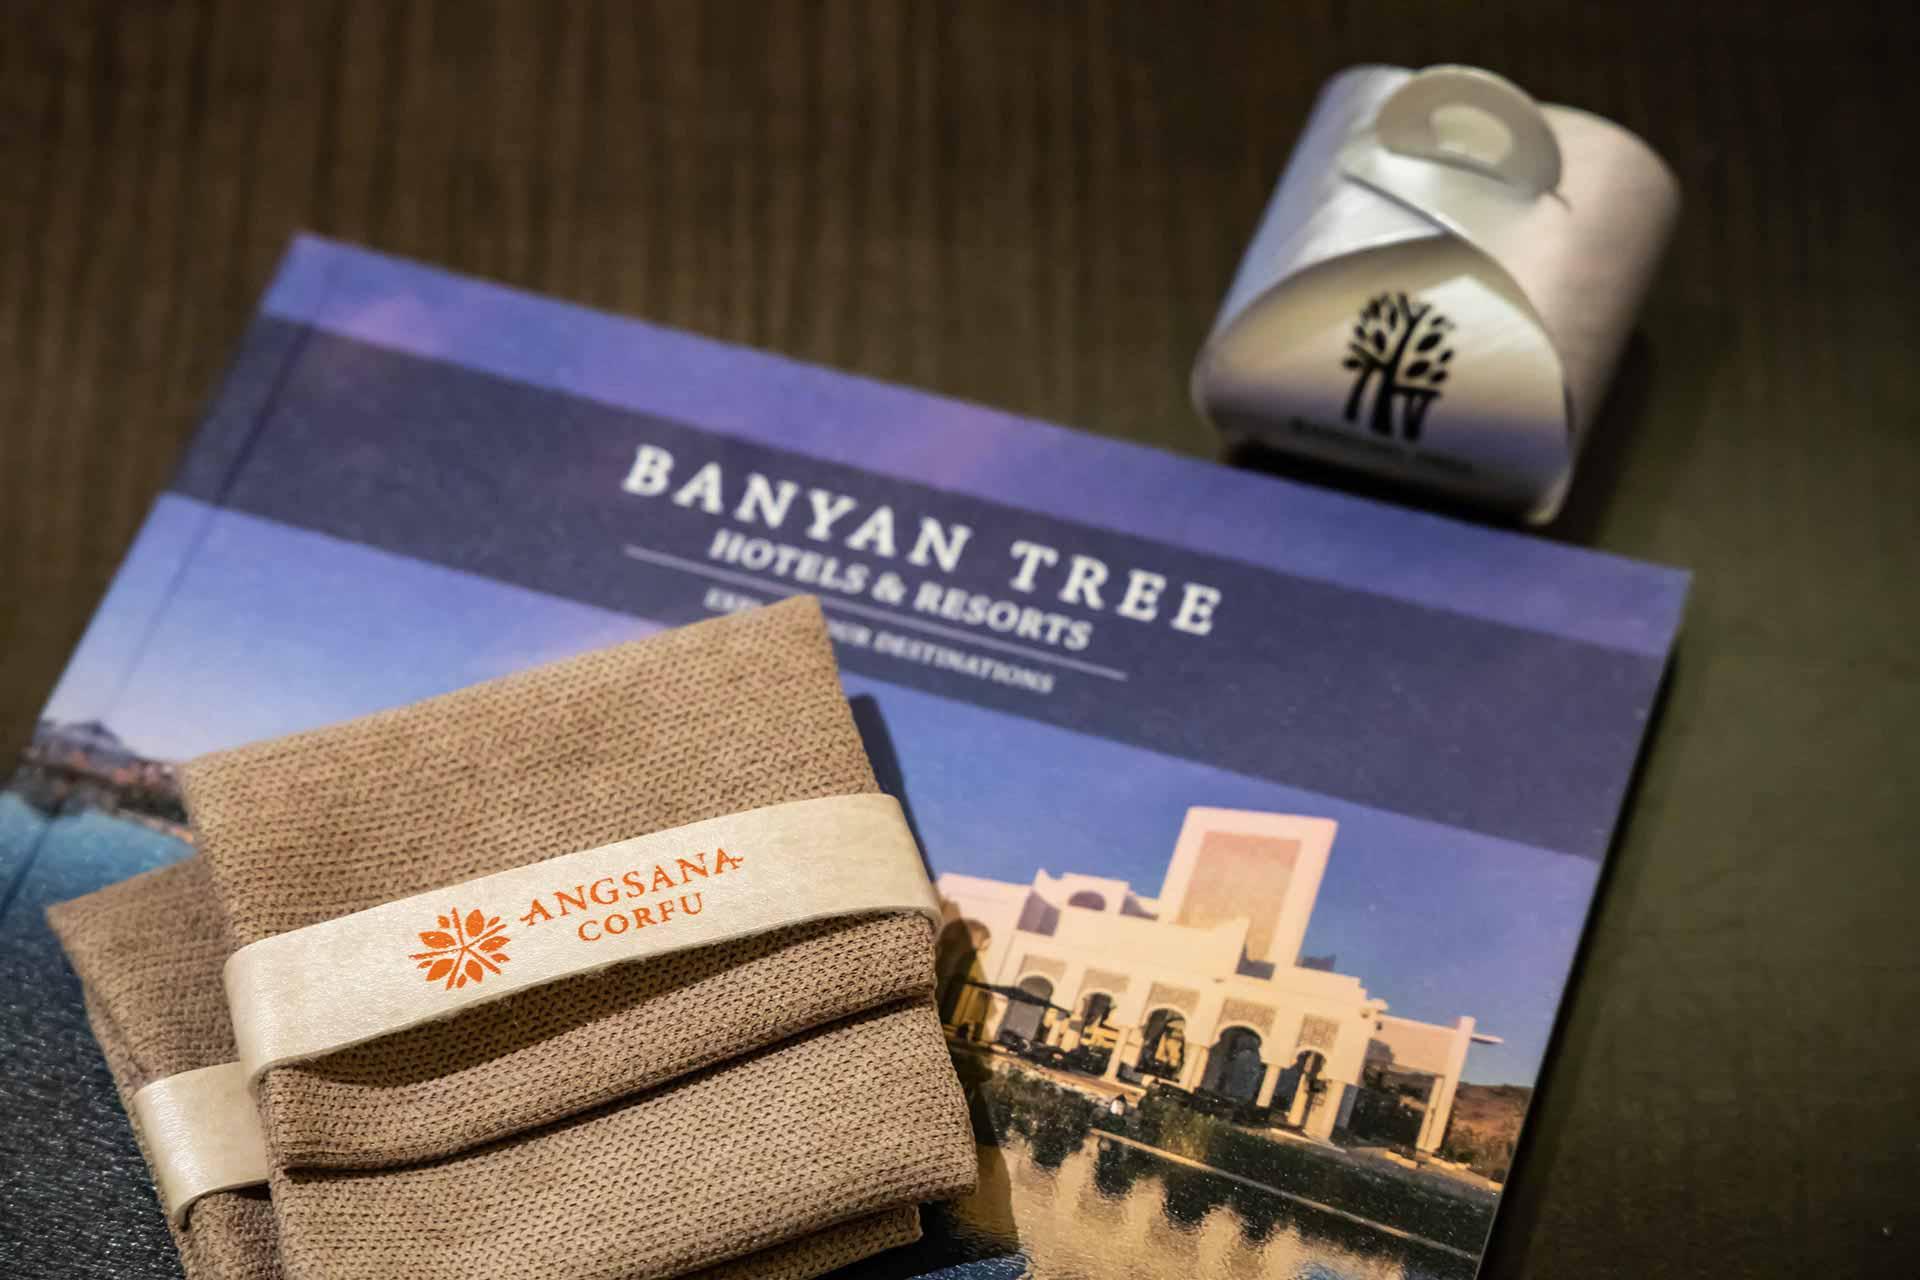 Banyan Tree Group